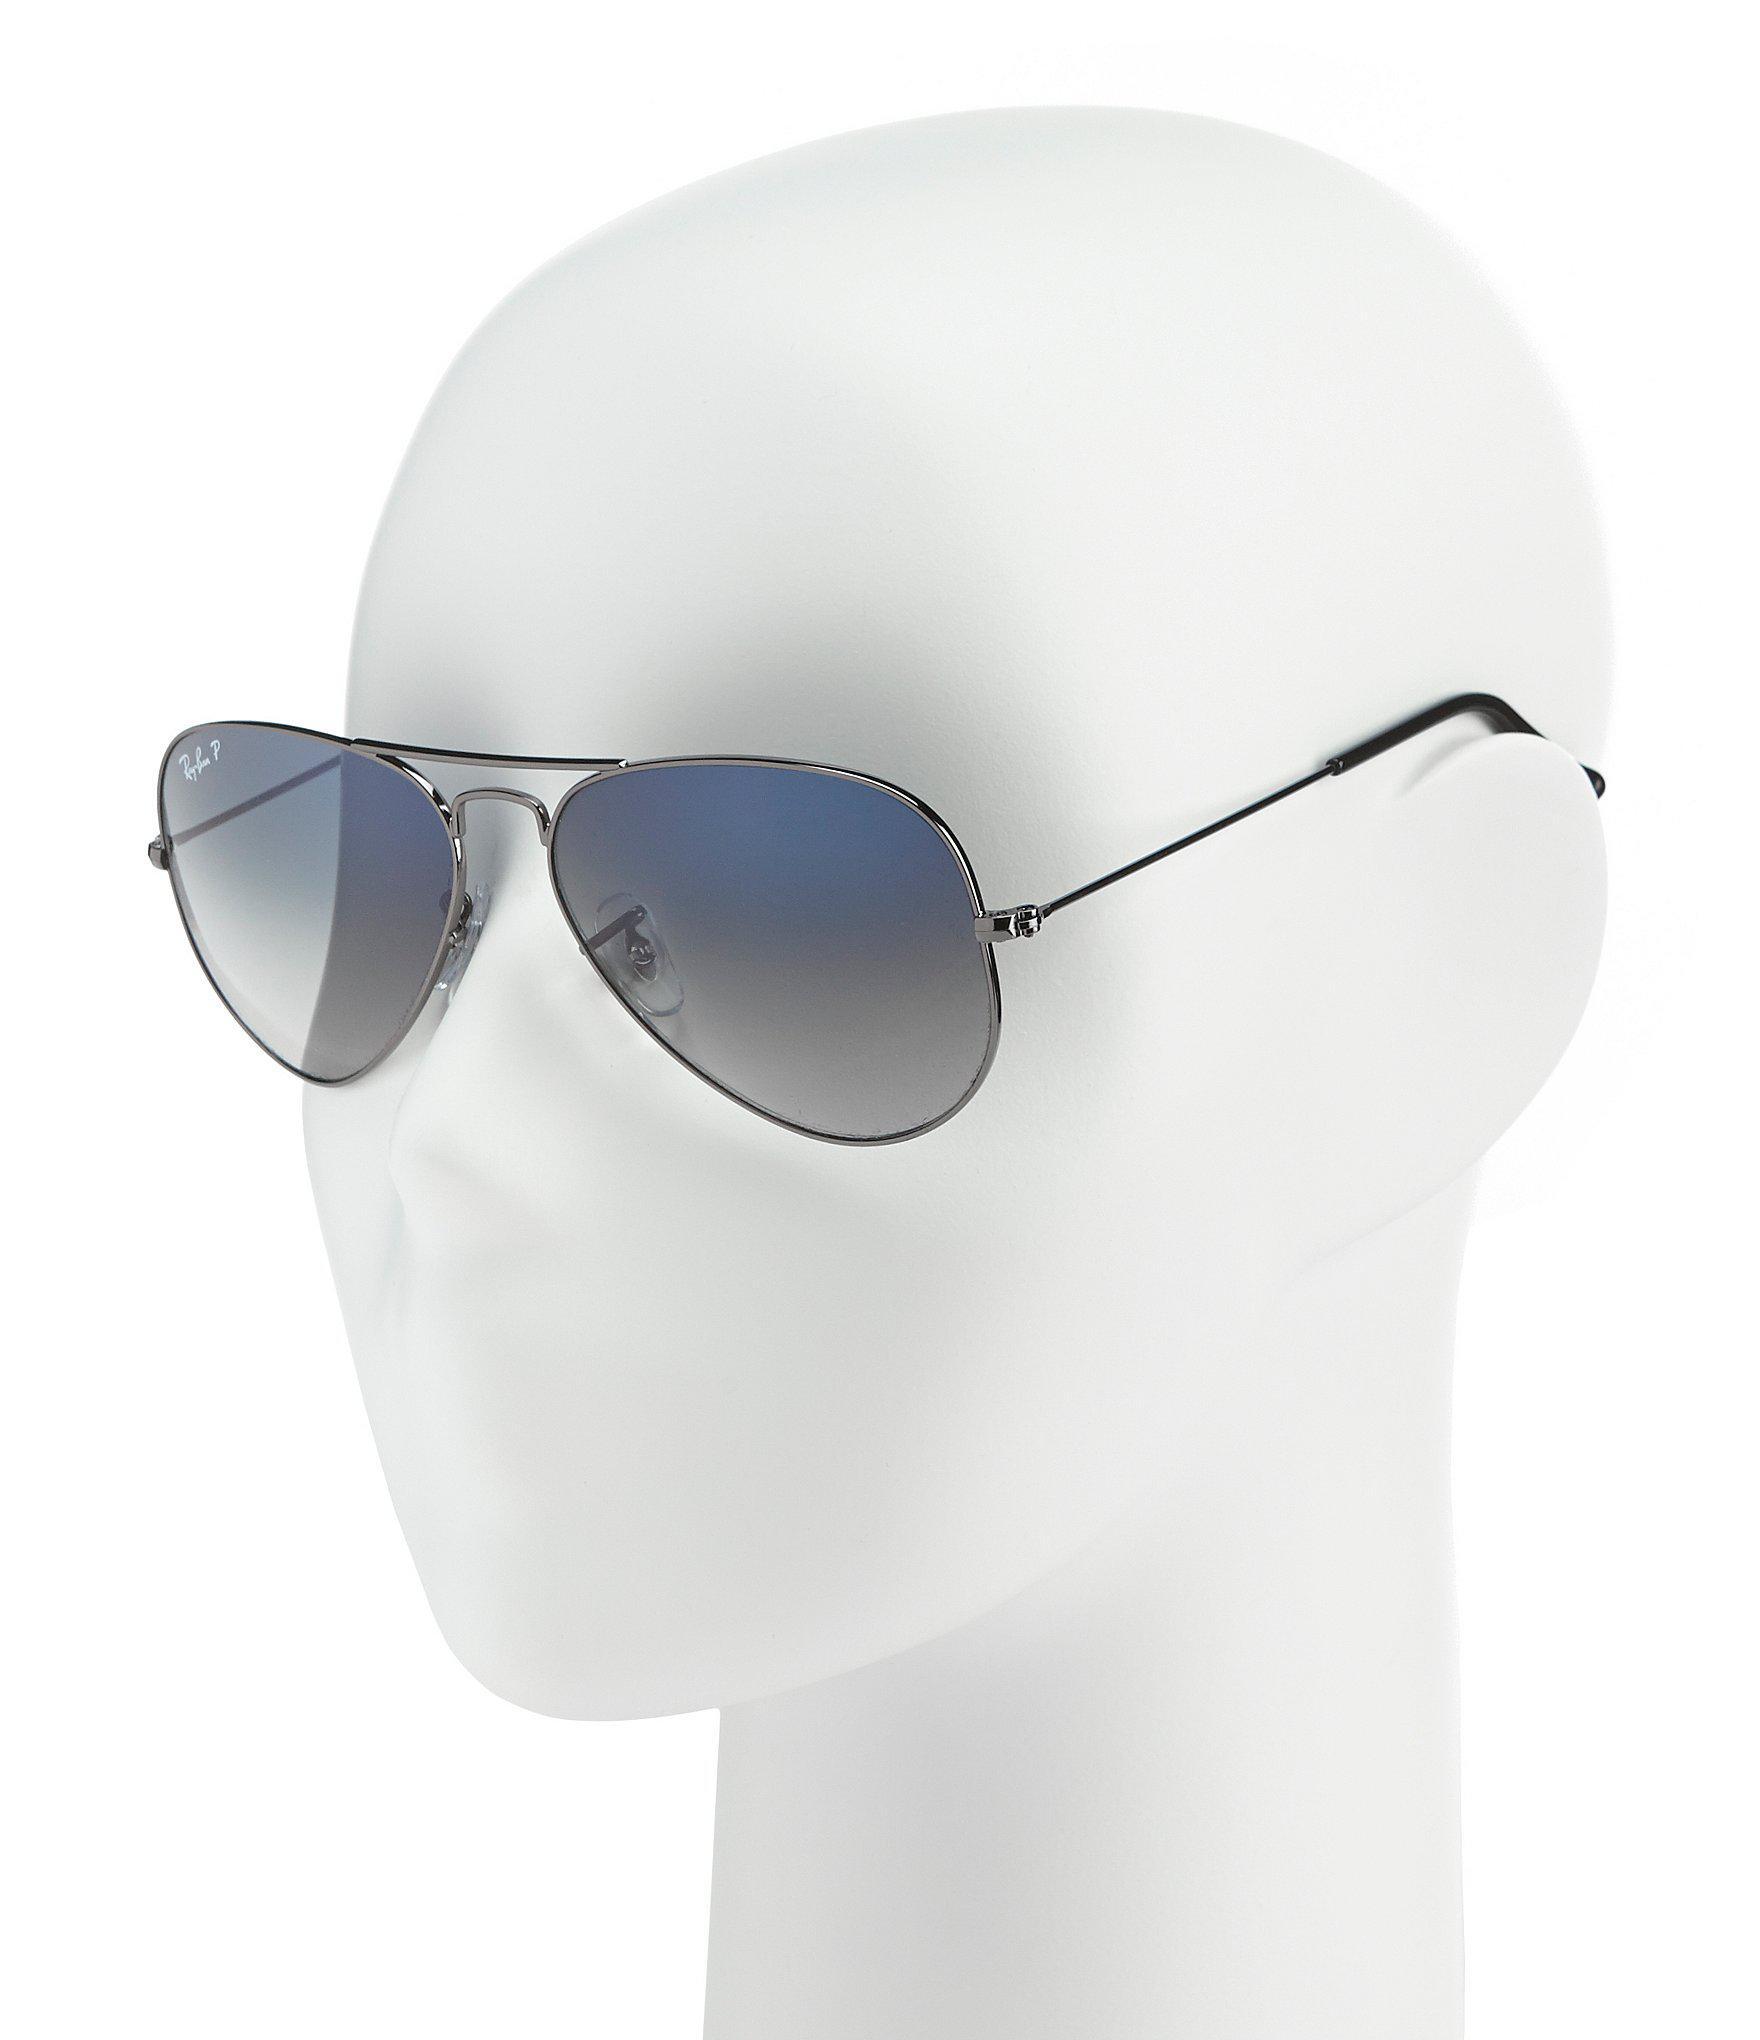 e5e76add70d Ray-Ban - Metallic Polarized Metal Uv Protection Aviator Sunglasses for Men  - Lyst. View fullscreen